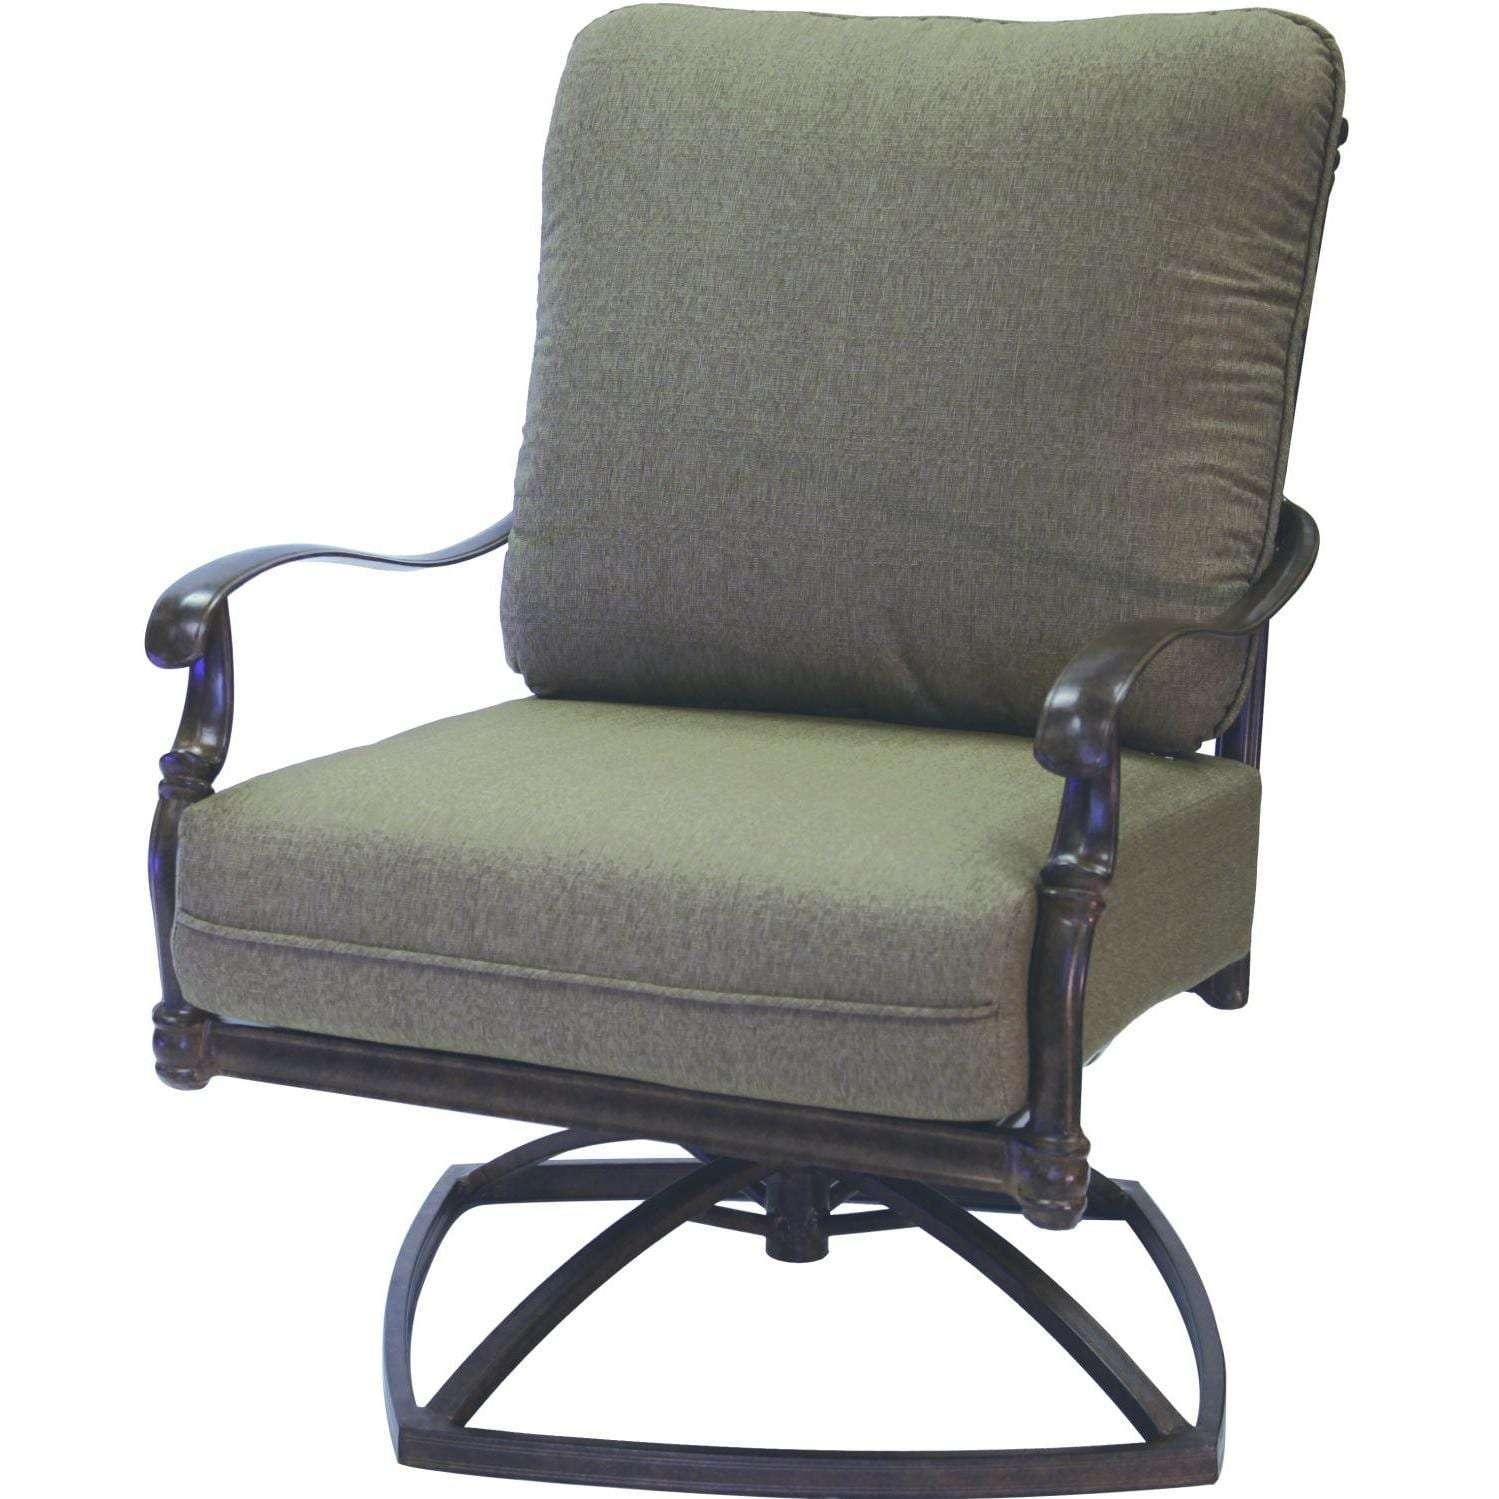 Darlee Florence 3 Piece Cast Aluminum Conversation Seating Set